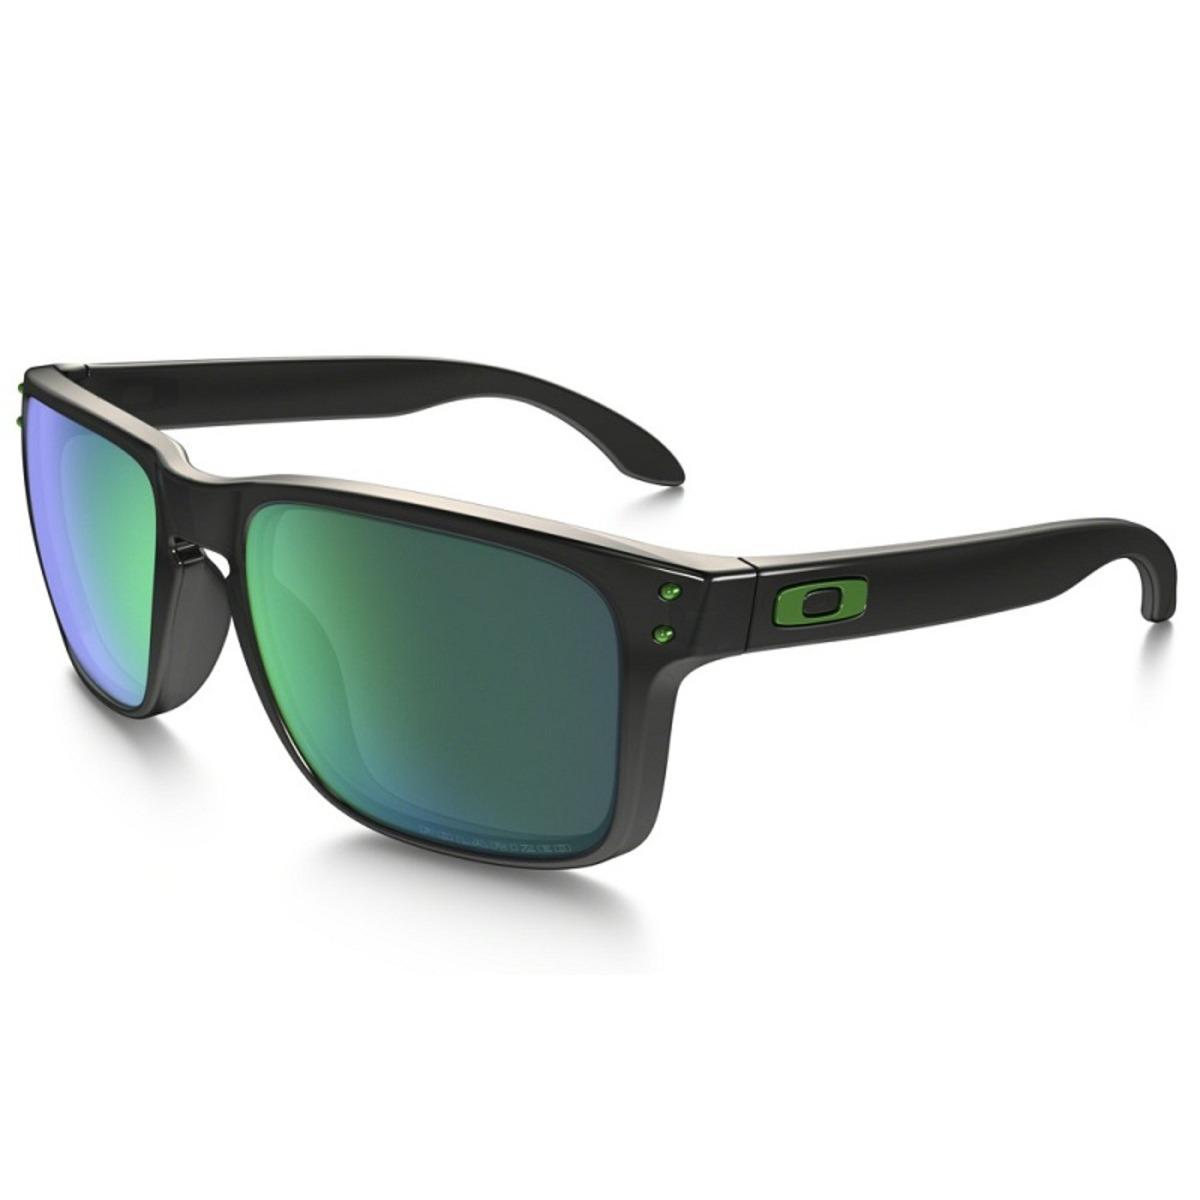 afb7d4c7c0704 óculos oakley holbrook polished black  lente jade iridium po. Carregando  zoom.